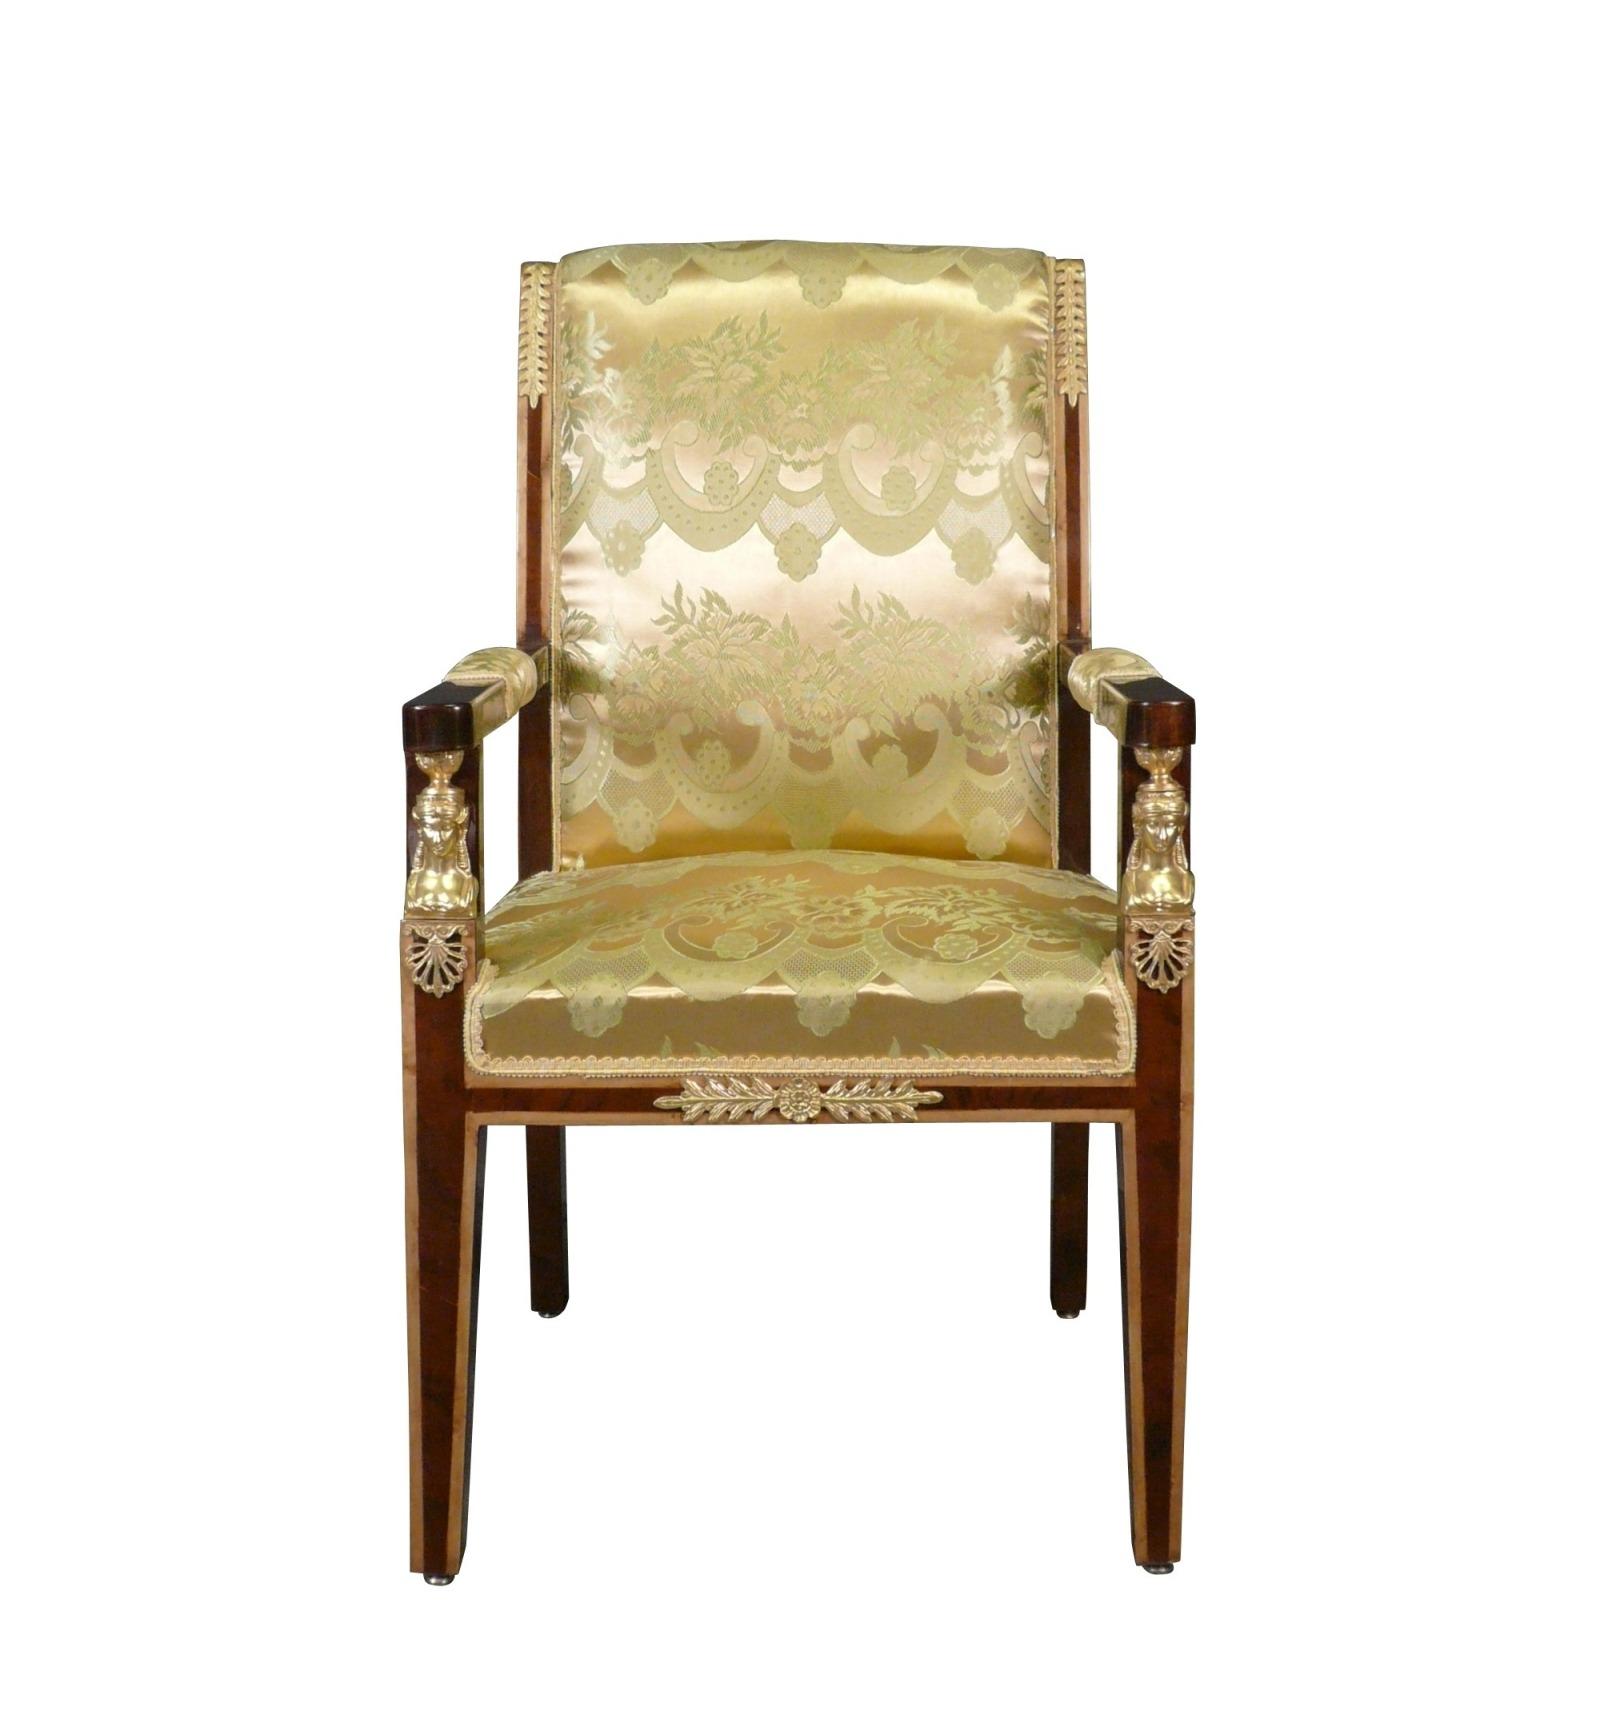 empire sessel satin stoff gold napoleon iii m bel. Black Bedroom Furniture Sets. Home Design Ideas